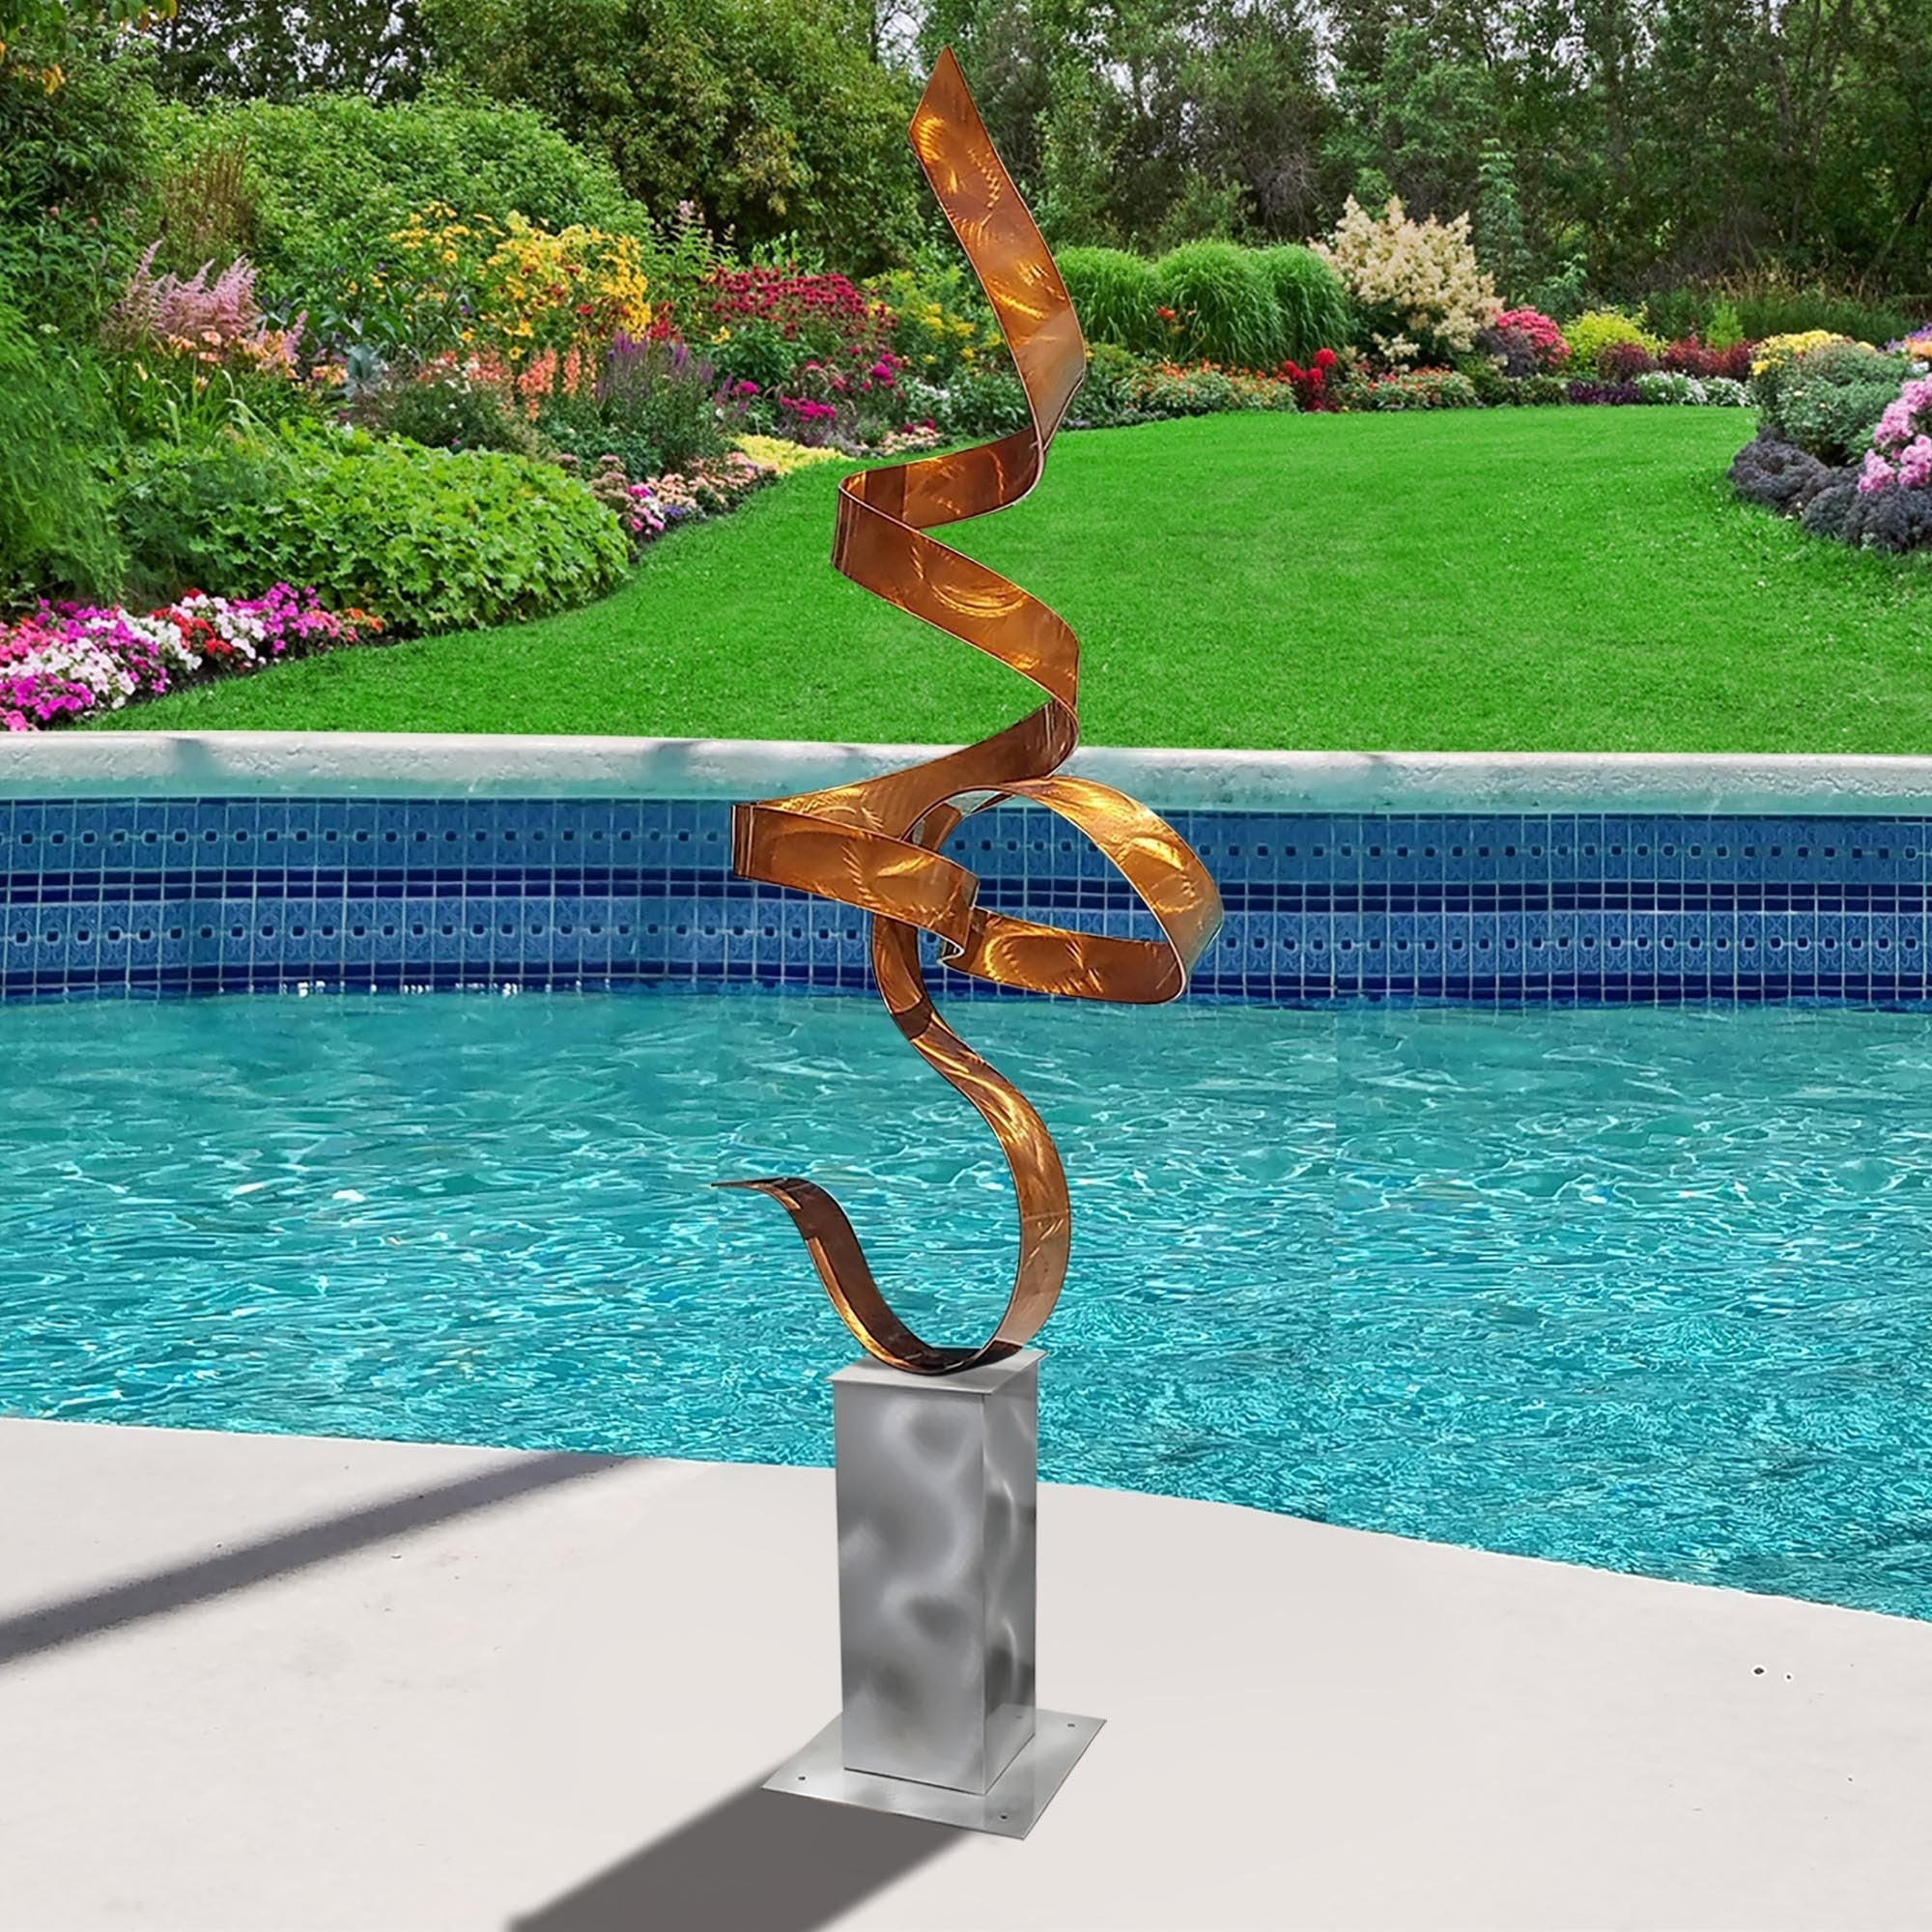 Metal Sculpture Contemporary Art Modern Garden Statue Office Decor Allure Silver Base by Jon Allen Abstract Indoor Outdoor Art